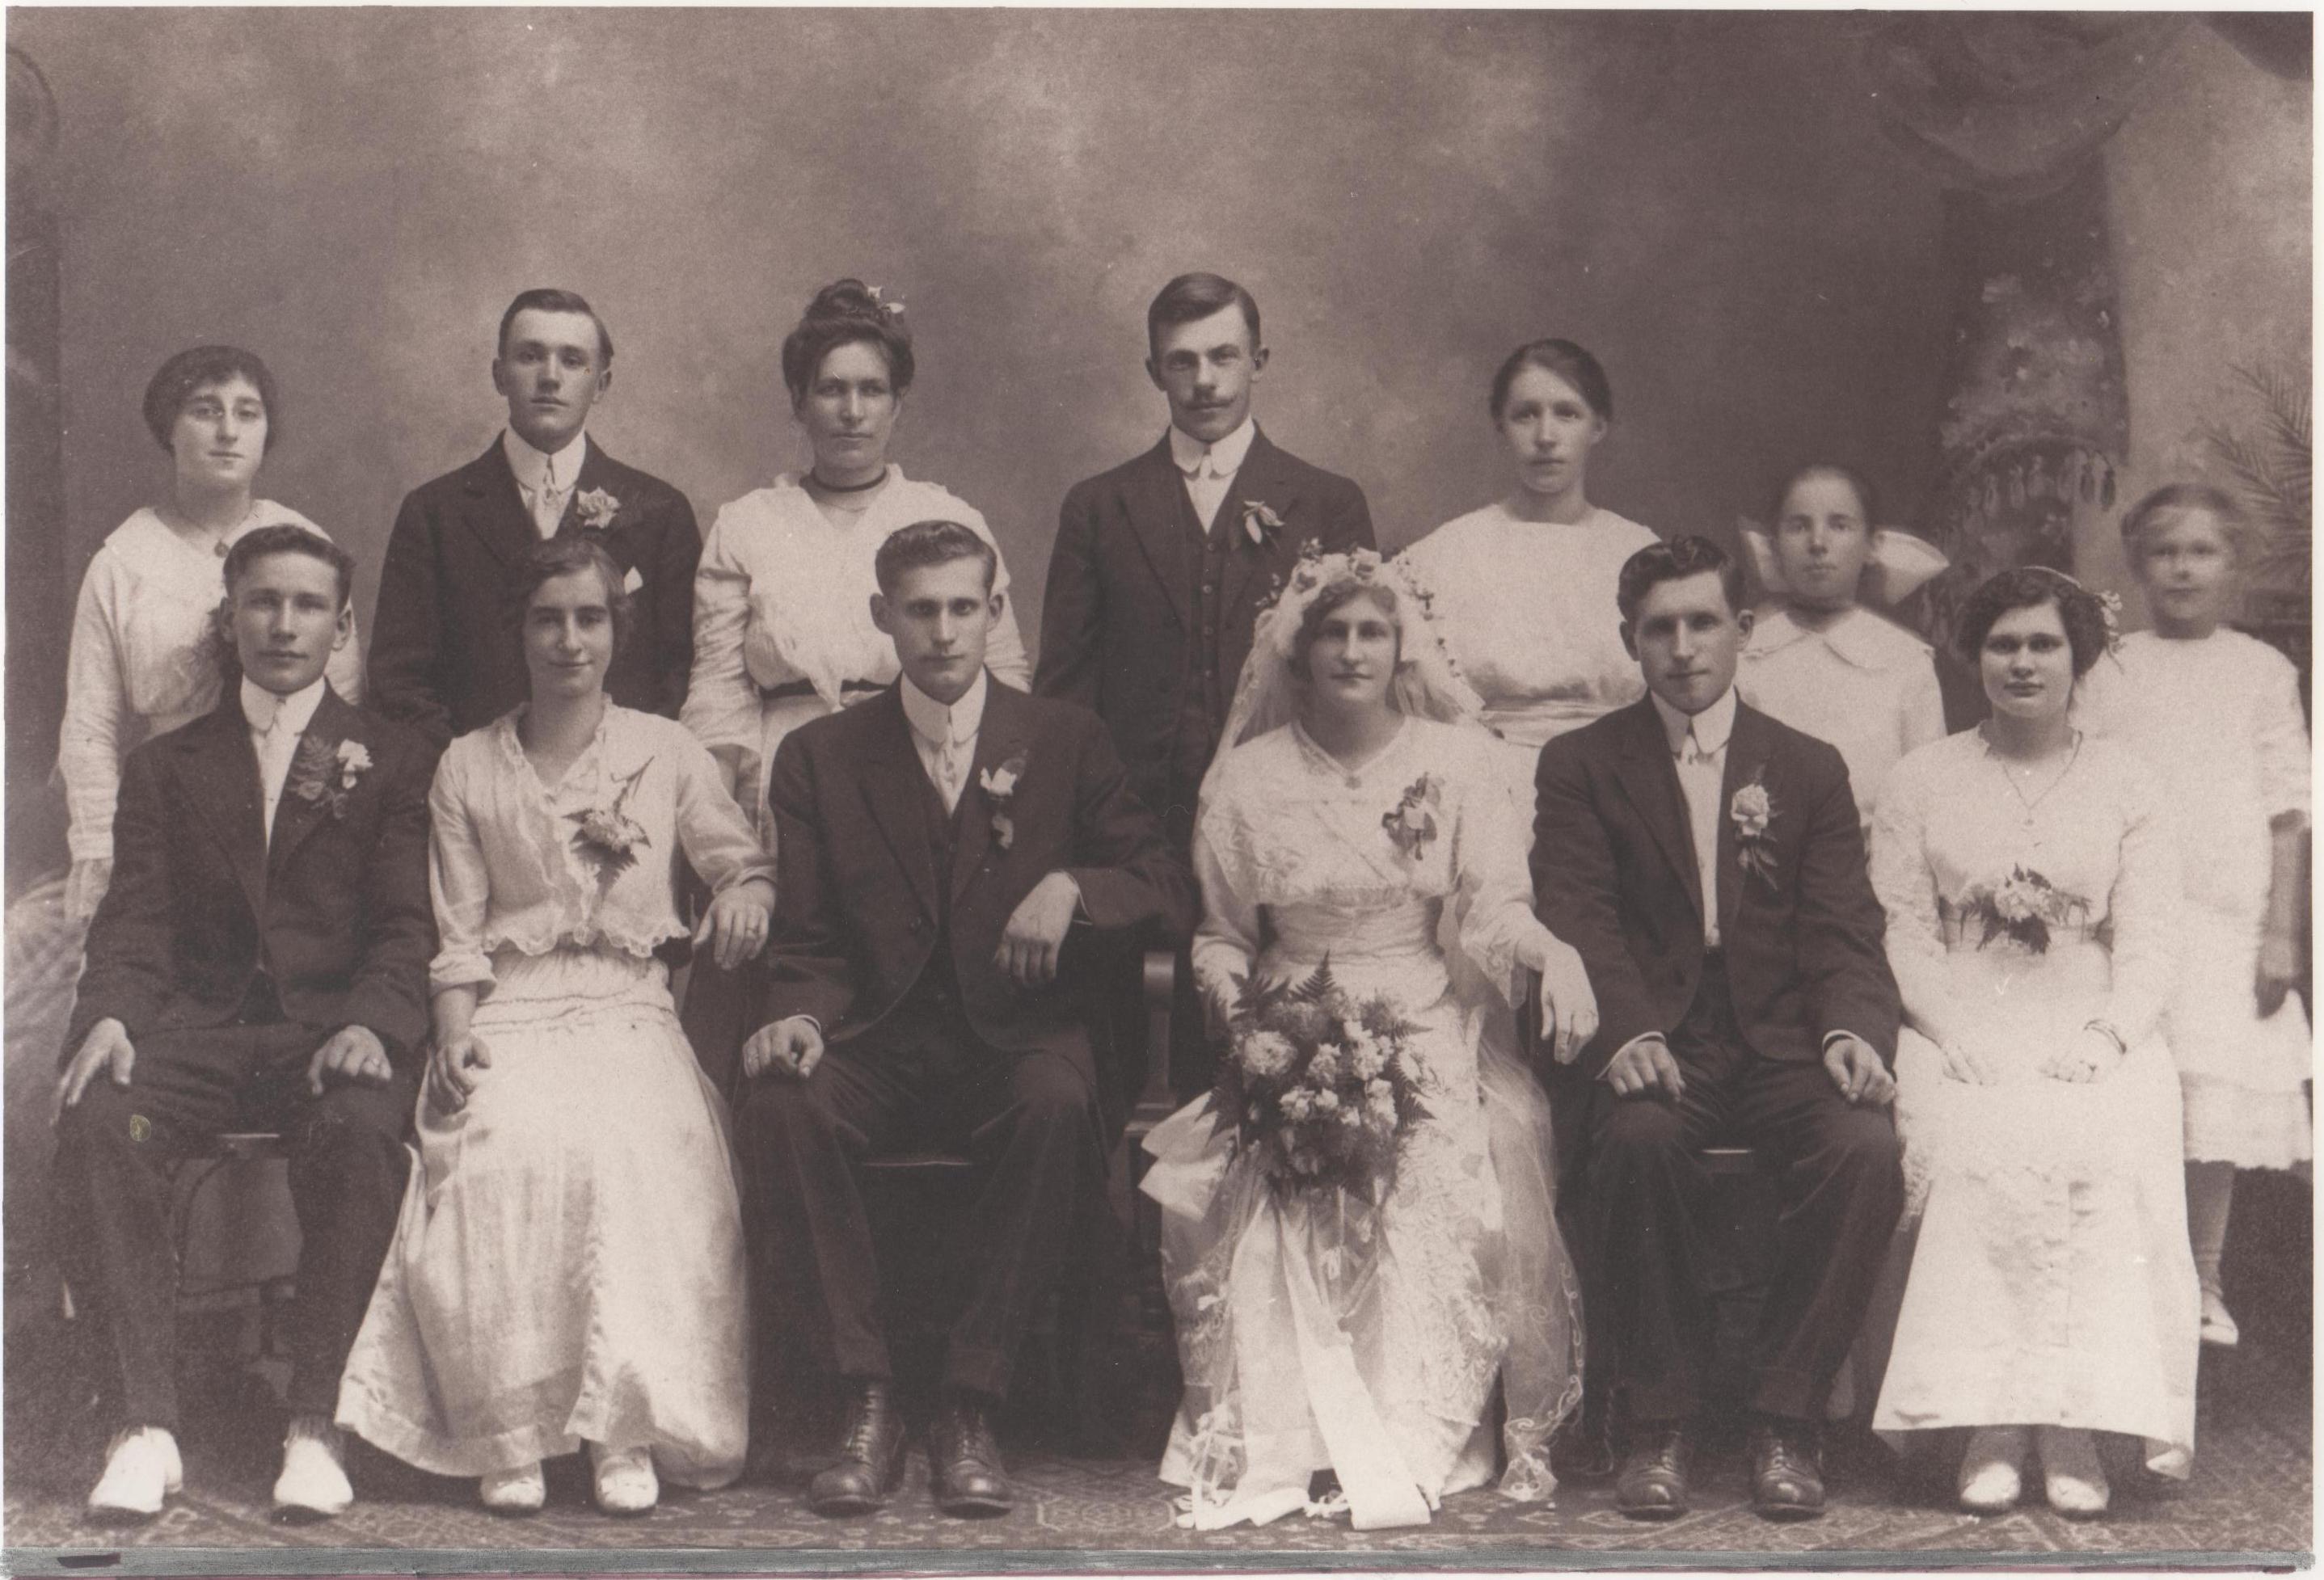 Genevieve Klaus & Joseph Zielinski wedding party